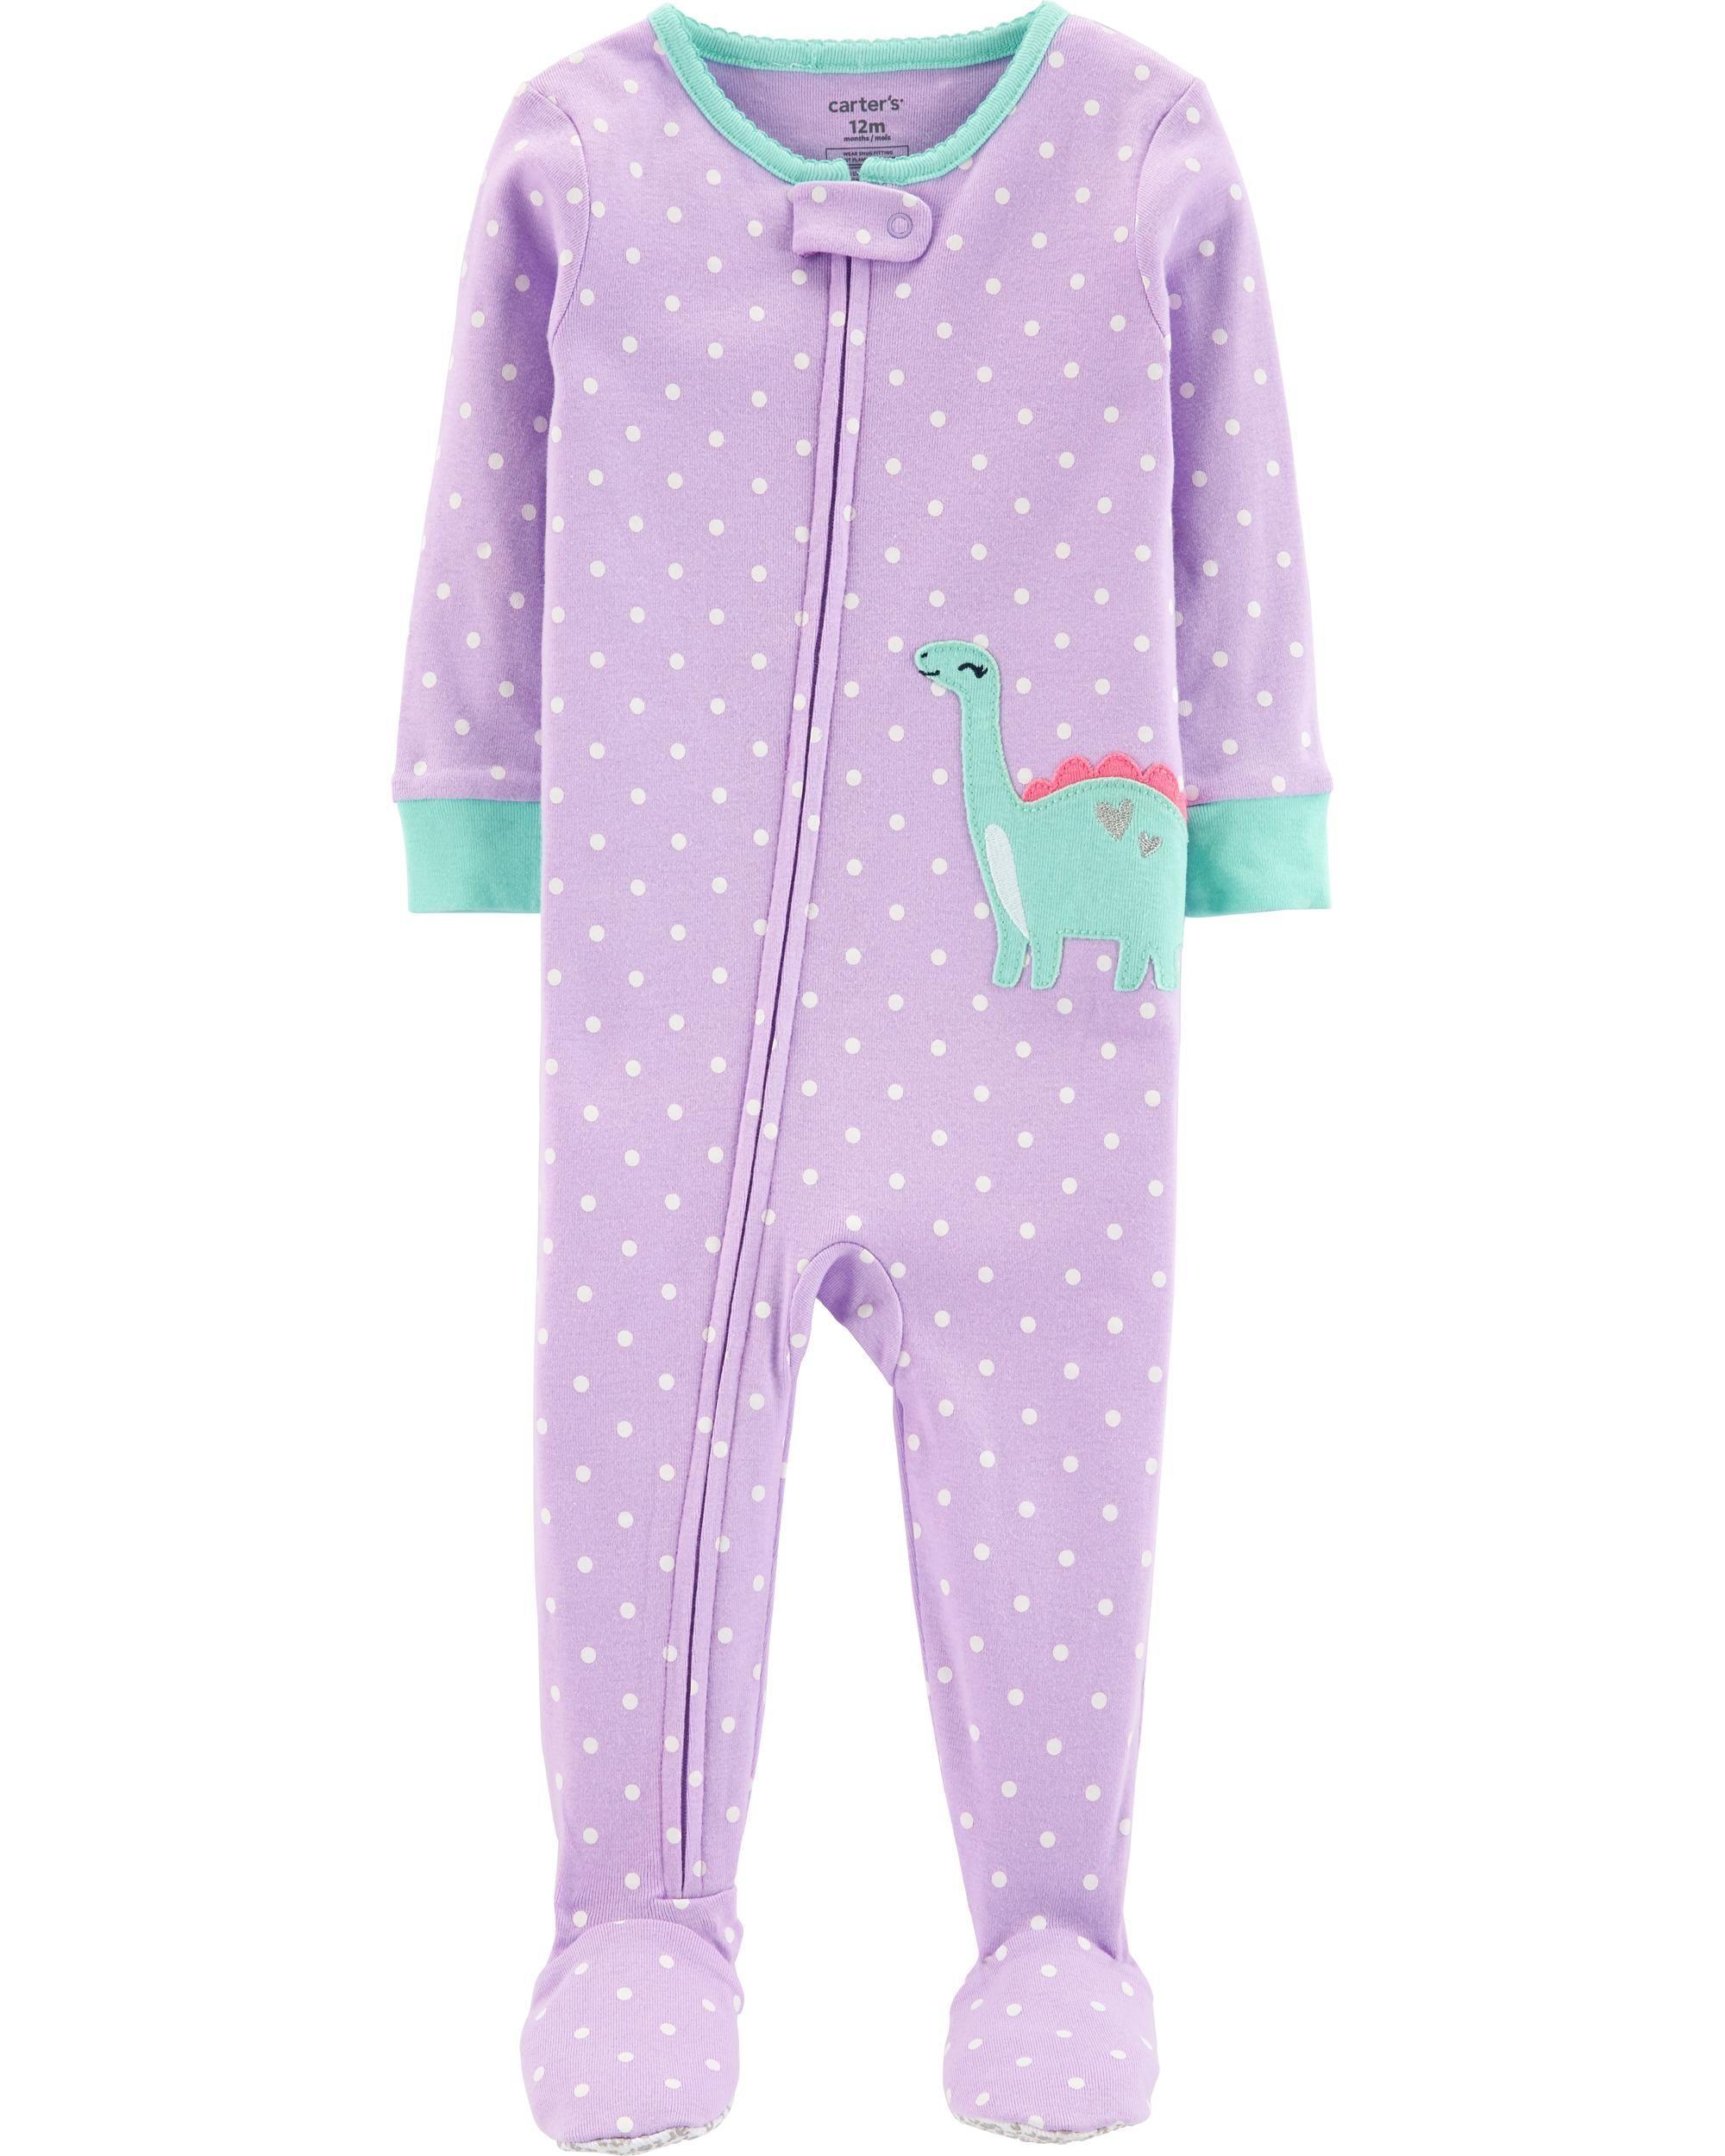 One-Piece Pajama Carter/'s Toddler Girls Cotton Footless Dinosaur Sleeper